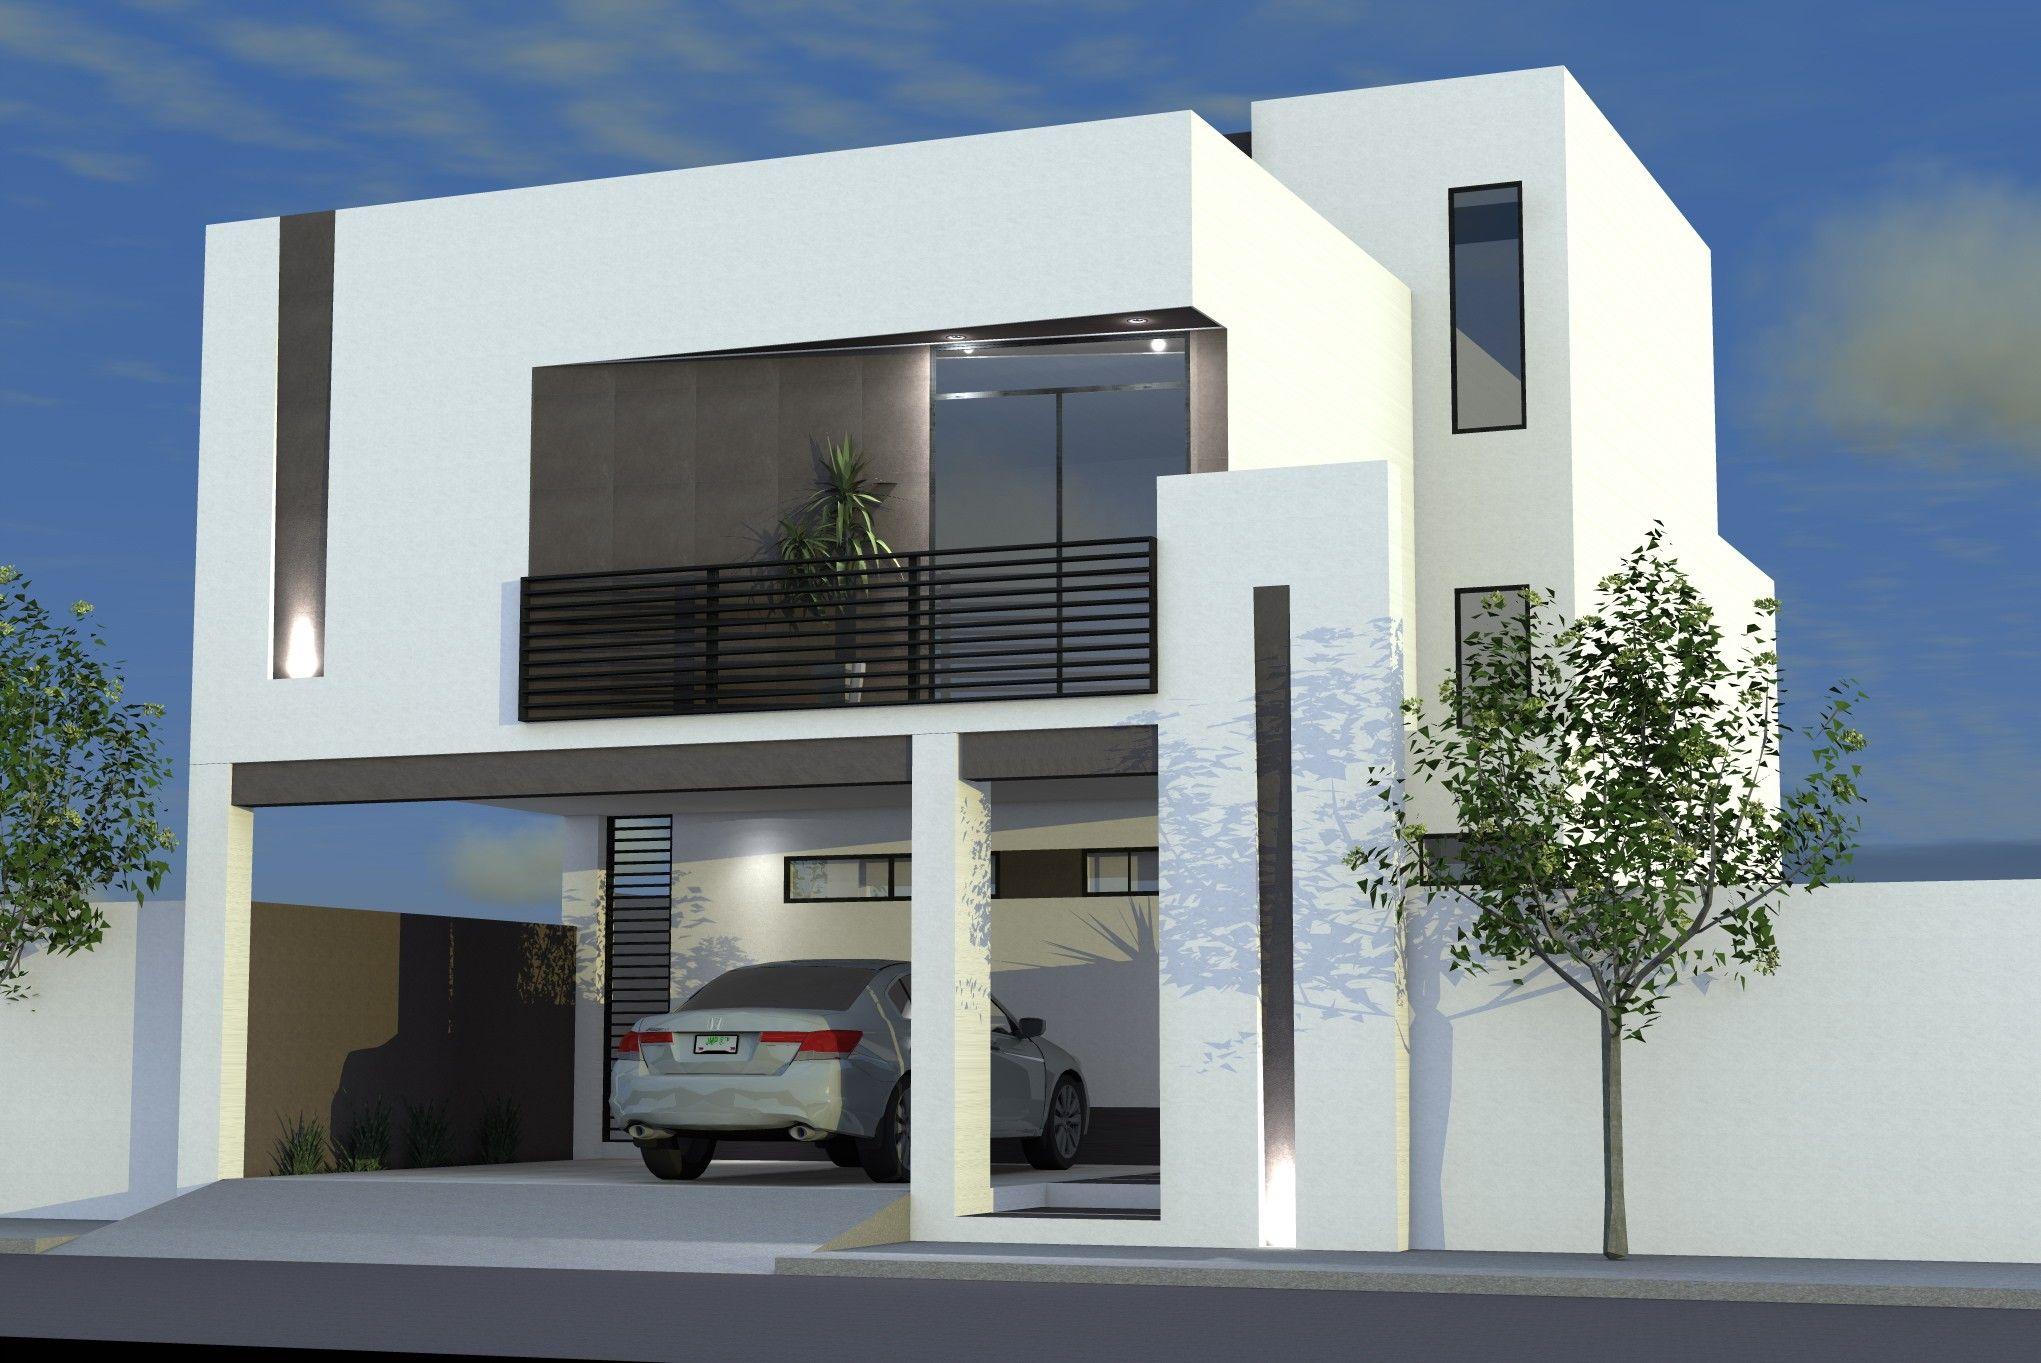 Porton herreria minimalista buscar con google fachadas for Fachadas duplex minimalistas